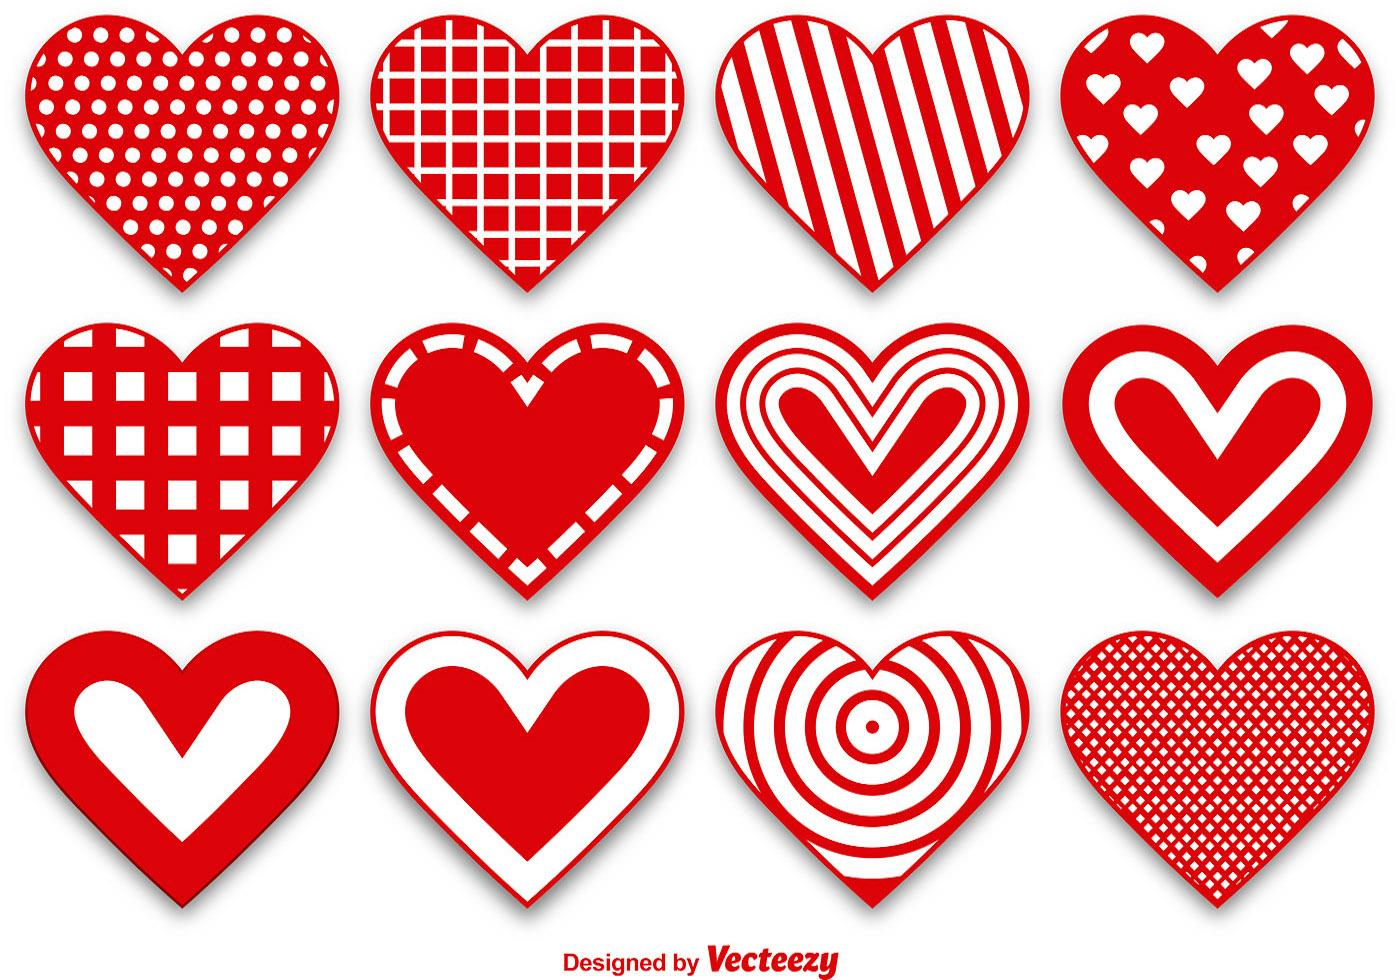 картинки сердце шаблон фото открытка такой